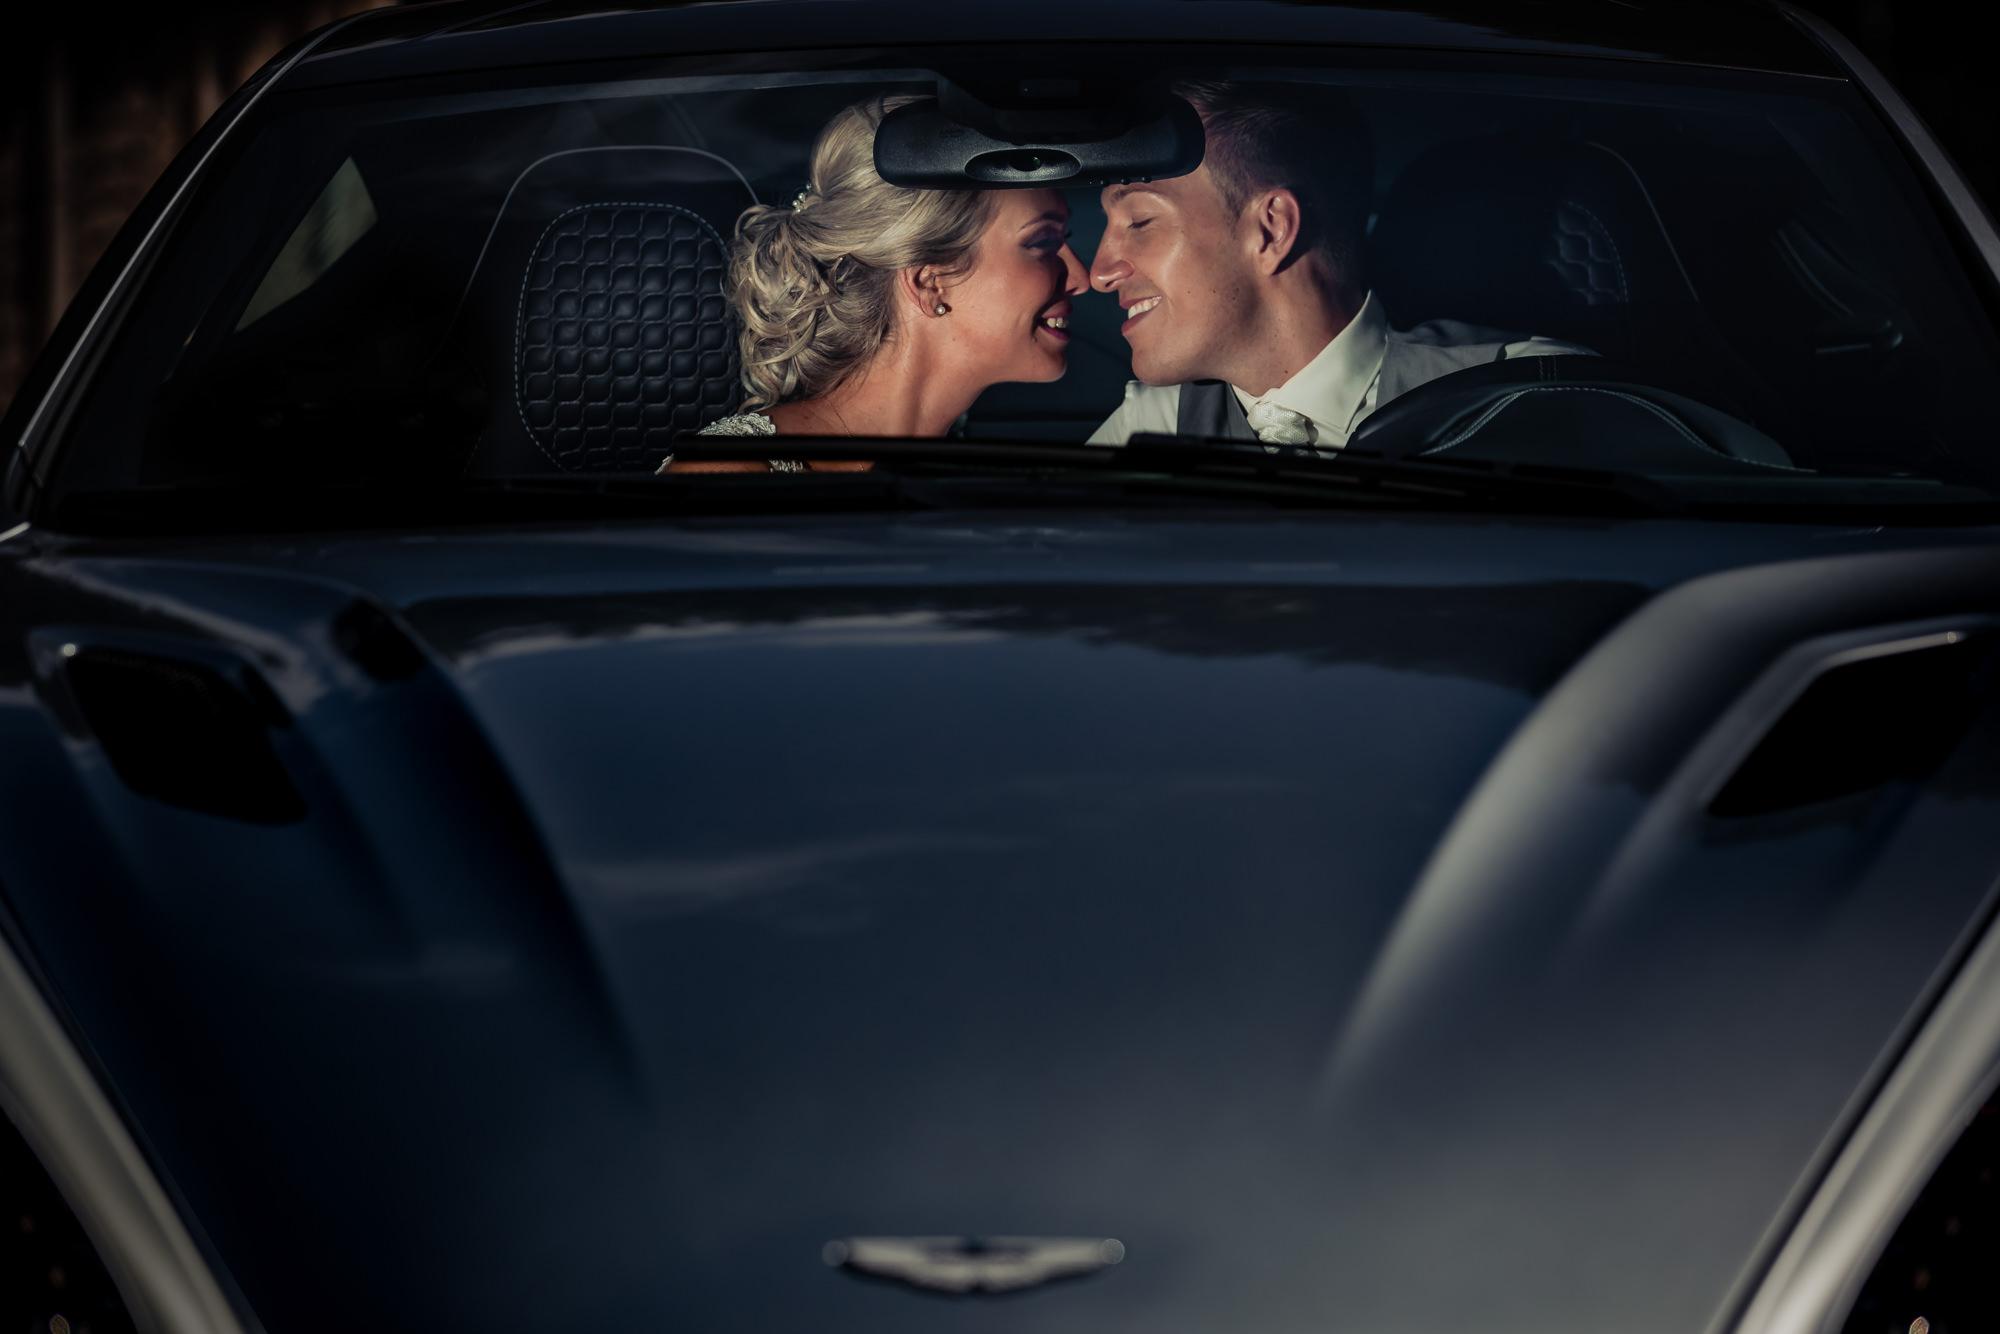 bride-groom-kissing-taken-through-windshield-worlds-best-wedding-photos-eppel-photography-weert-netherlands-wedding-photographers